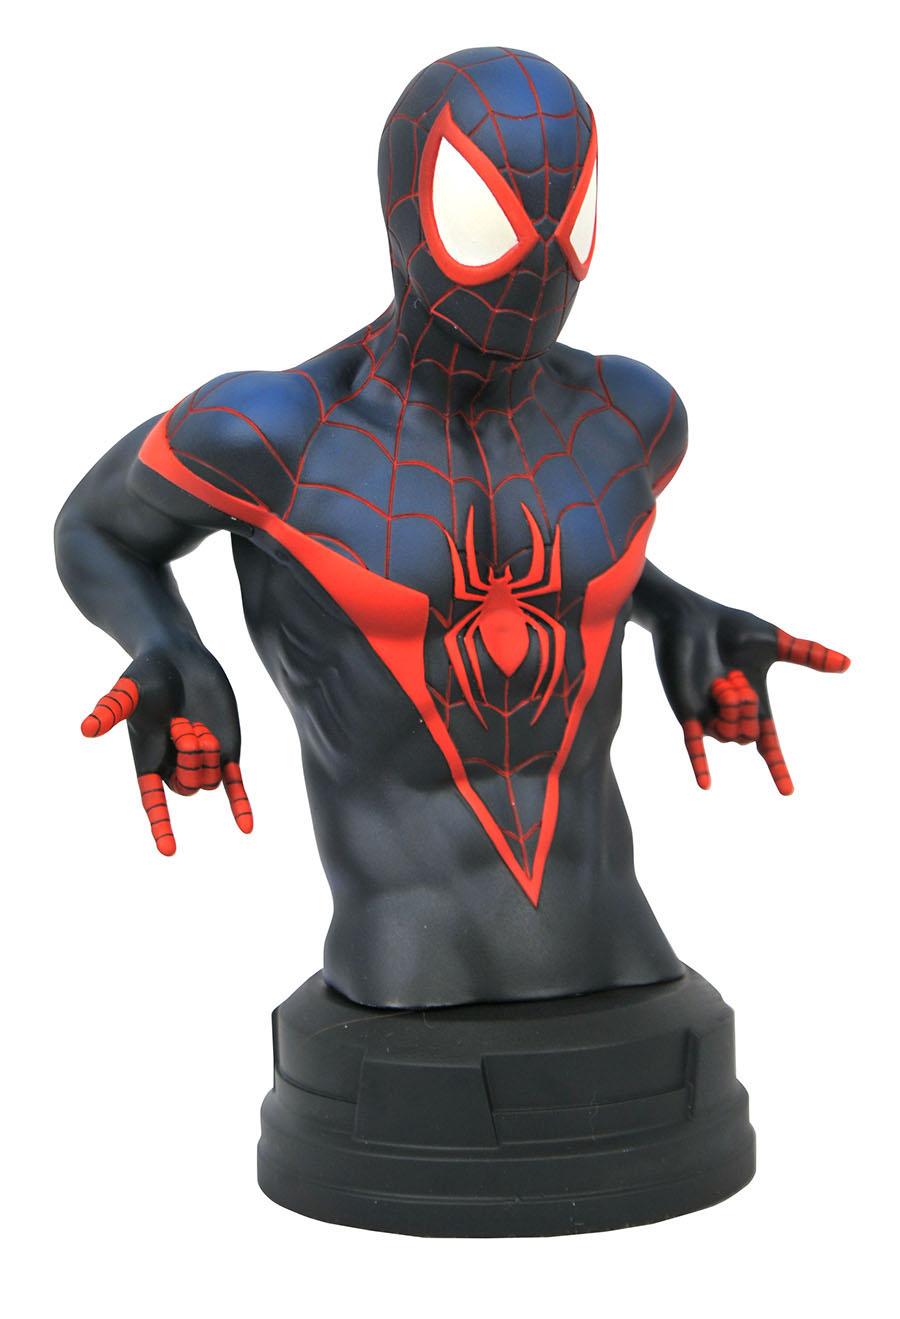 Marvel Comic Miles Morales Spider-Man Bust